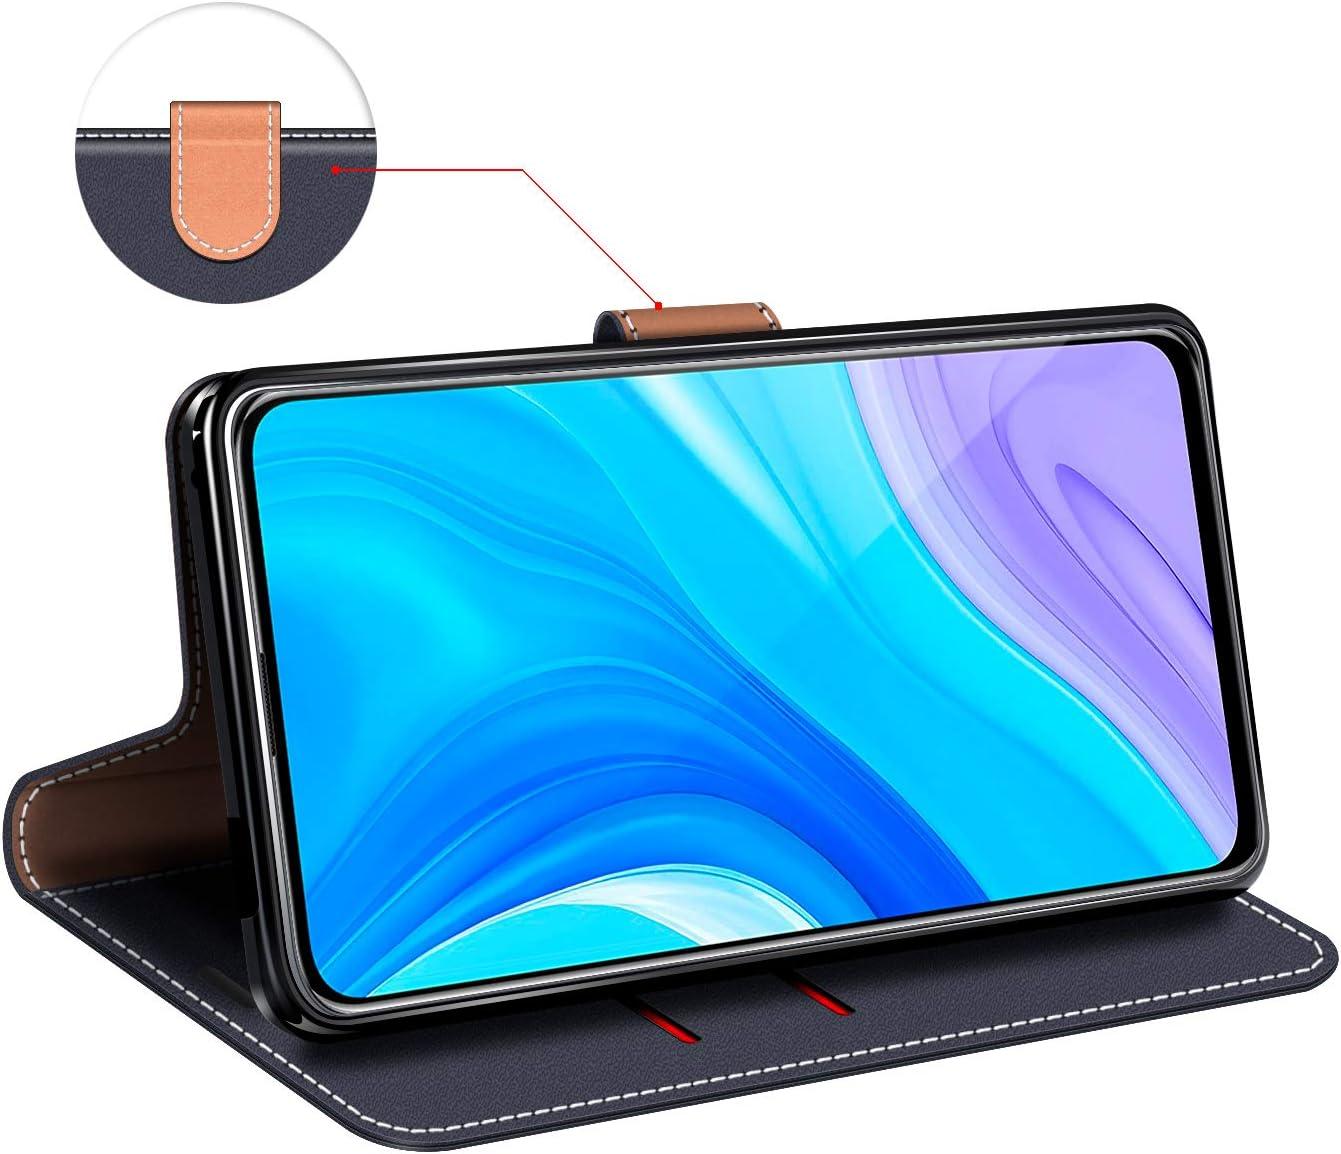 Funda Libro Huawei P Smart Pro Carcasa Magn/ético Funda para Huawei P Smart Pro COODIO Funda Huawei P Smart Pro con Tapa Funda Movil Huawei P Smart Pro Negro